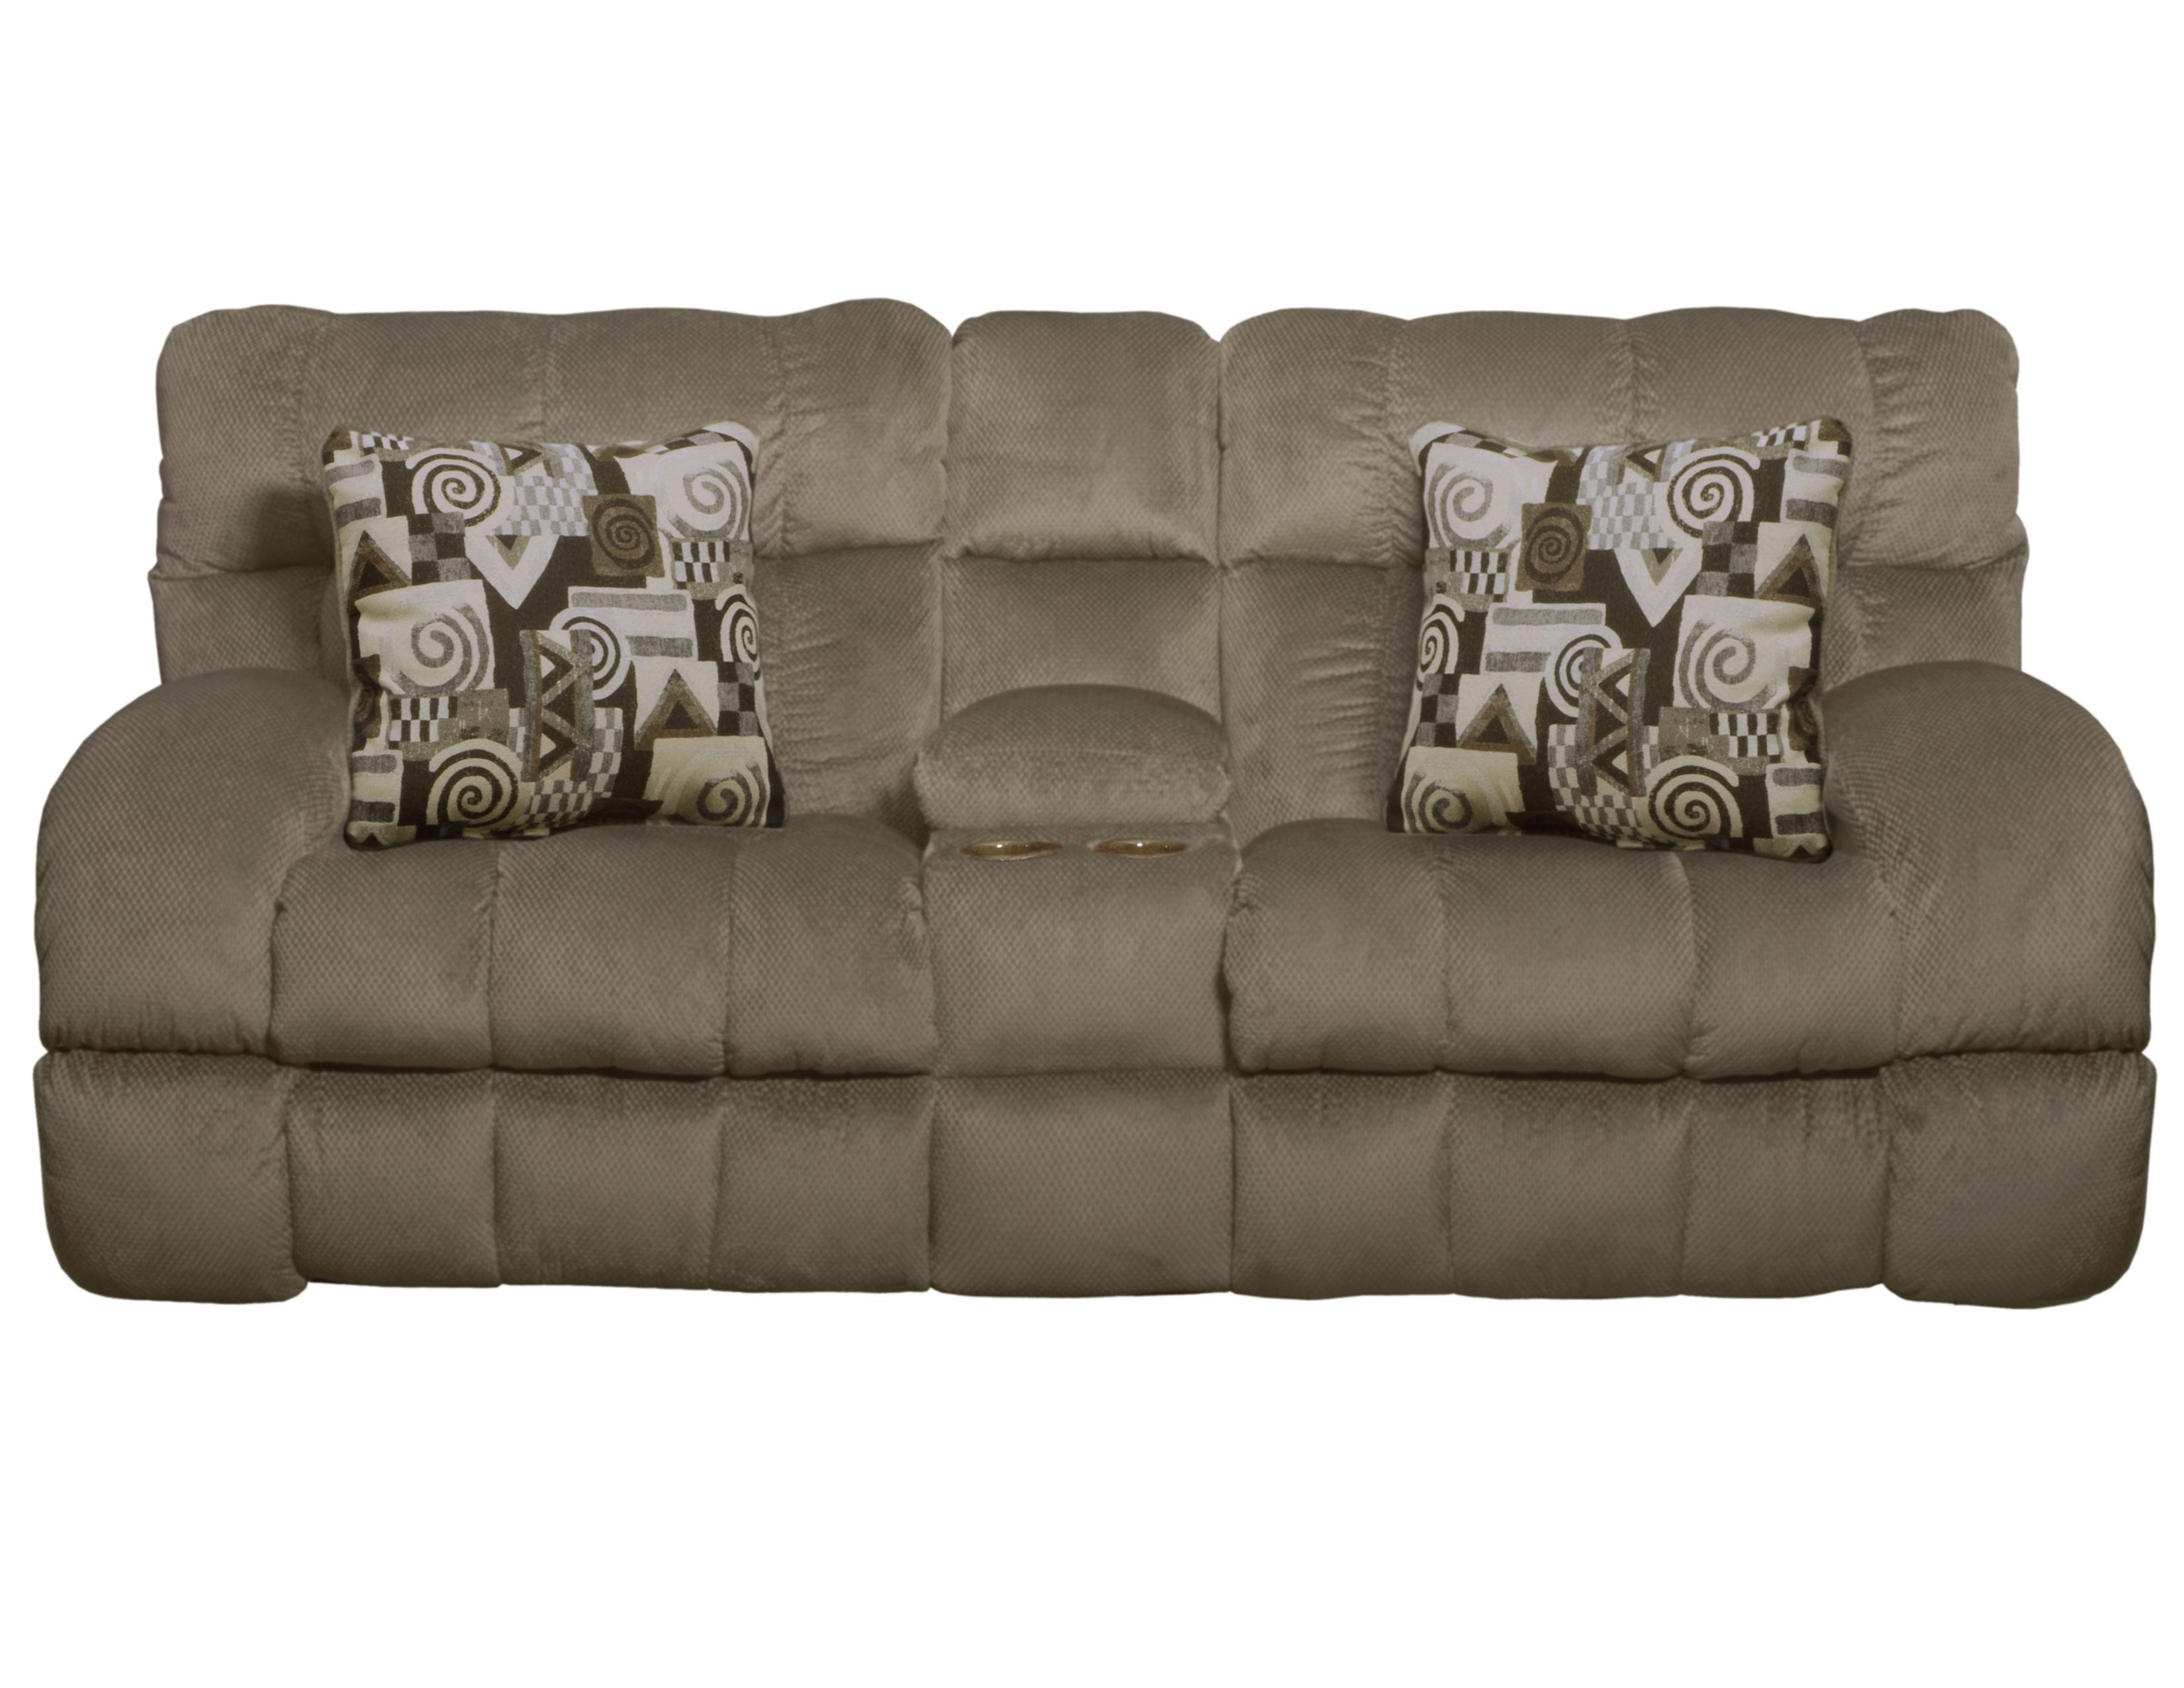 Admirable Siesta Layflat Dual Reclining Sofa Choice Of Sofas And Creativecarmelina Interior Chair Design Creativecarmelinacom